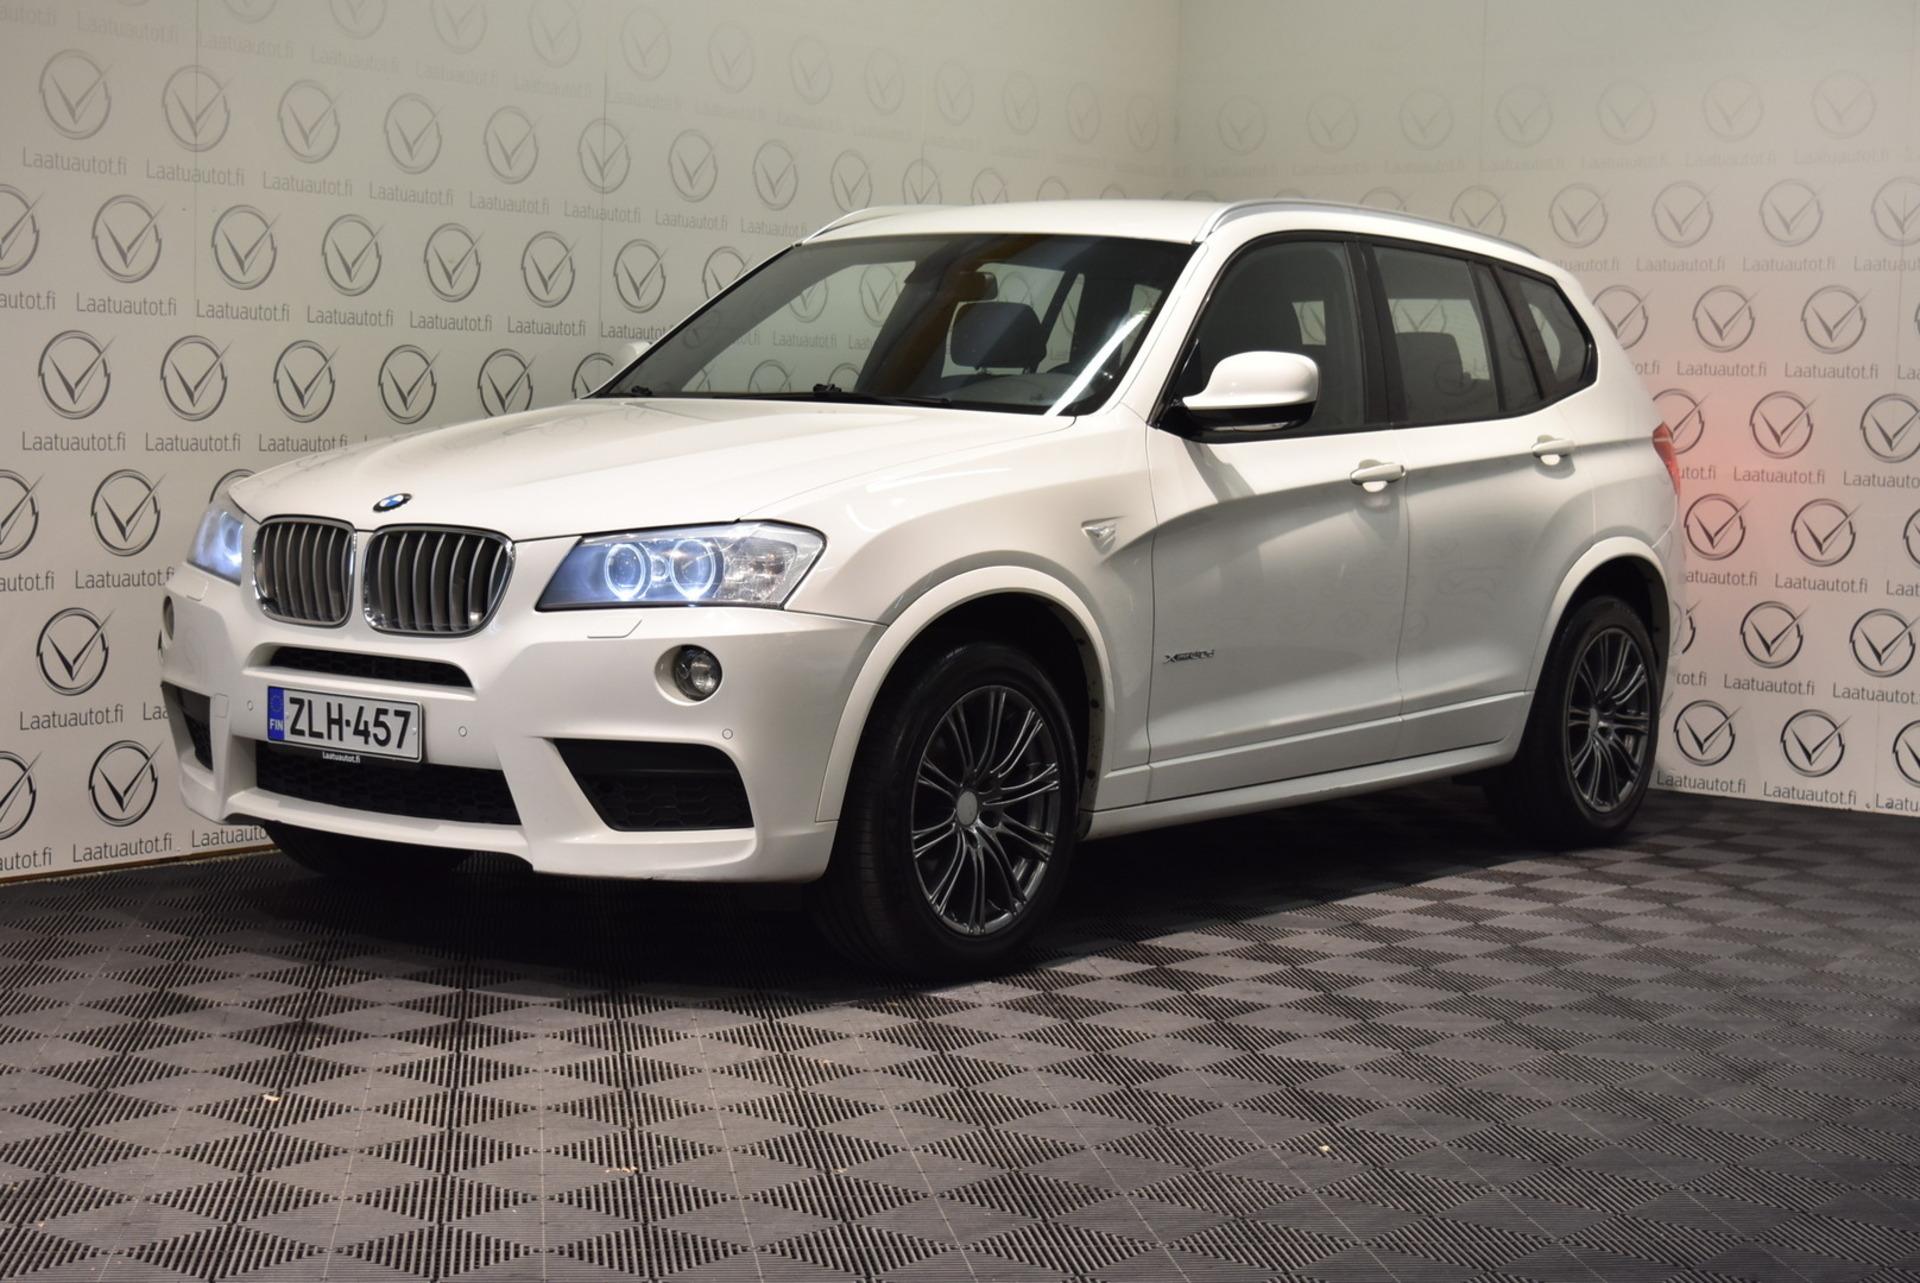 BMW X3 xdrive 30d A F25 M-Sport - Hieno M-Sport jopa ilman käsirahaa 1.89% rahoituksella! Sportpenkit,  ProNavi,  PDC,  Xenon,  Cruise